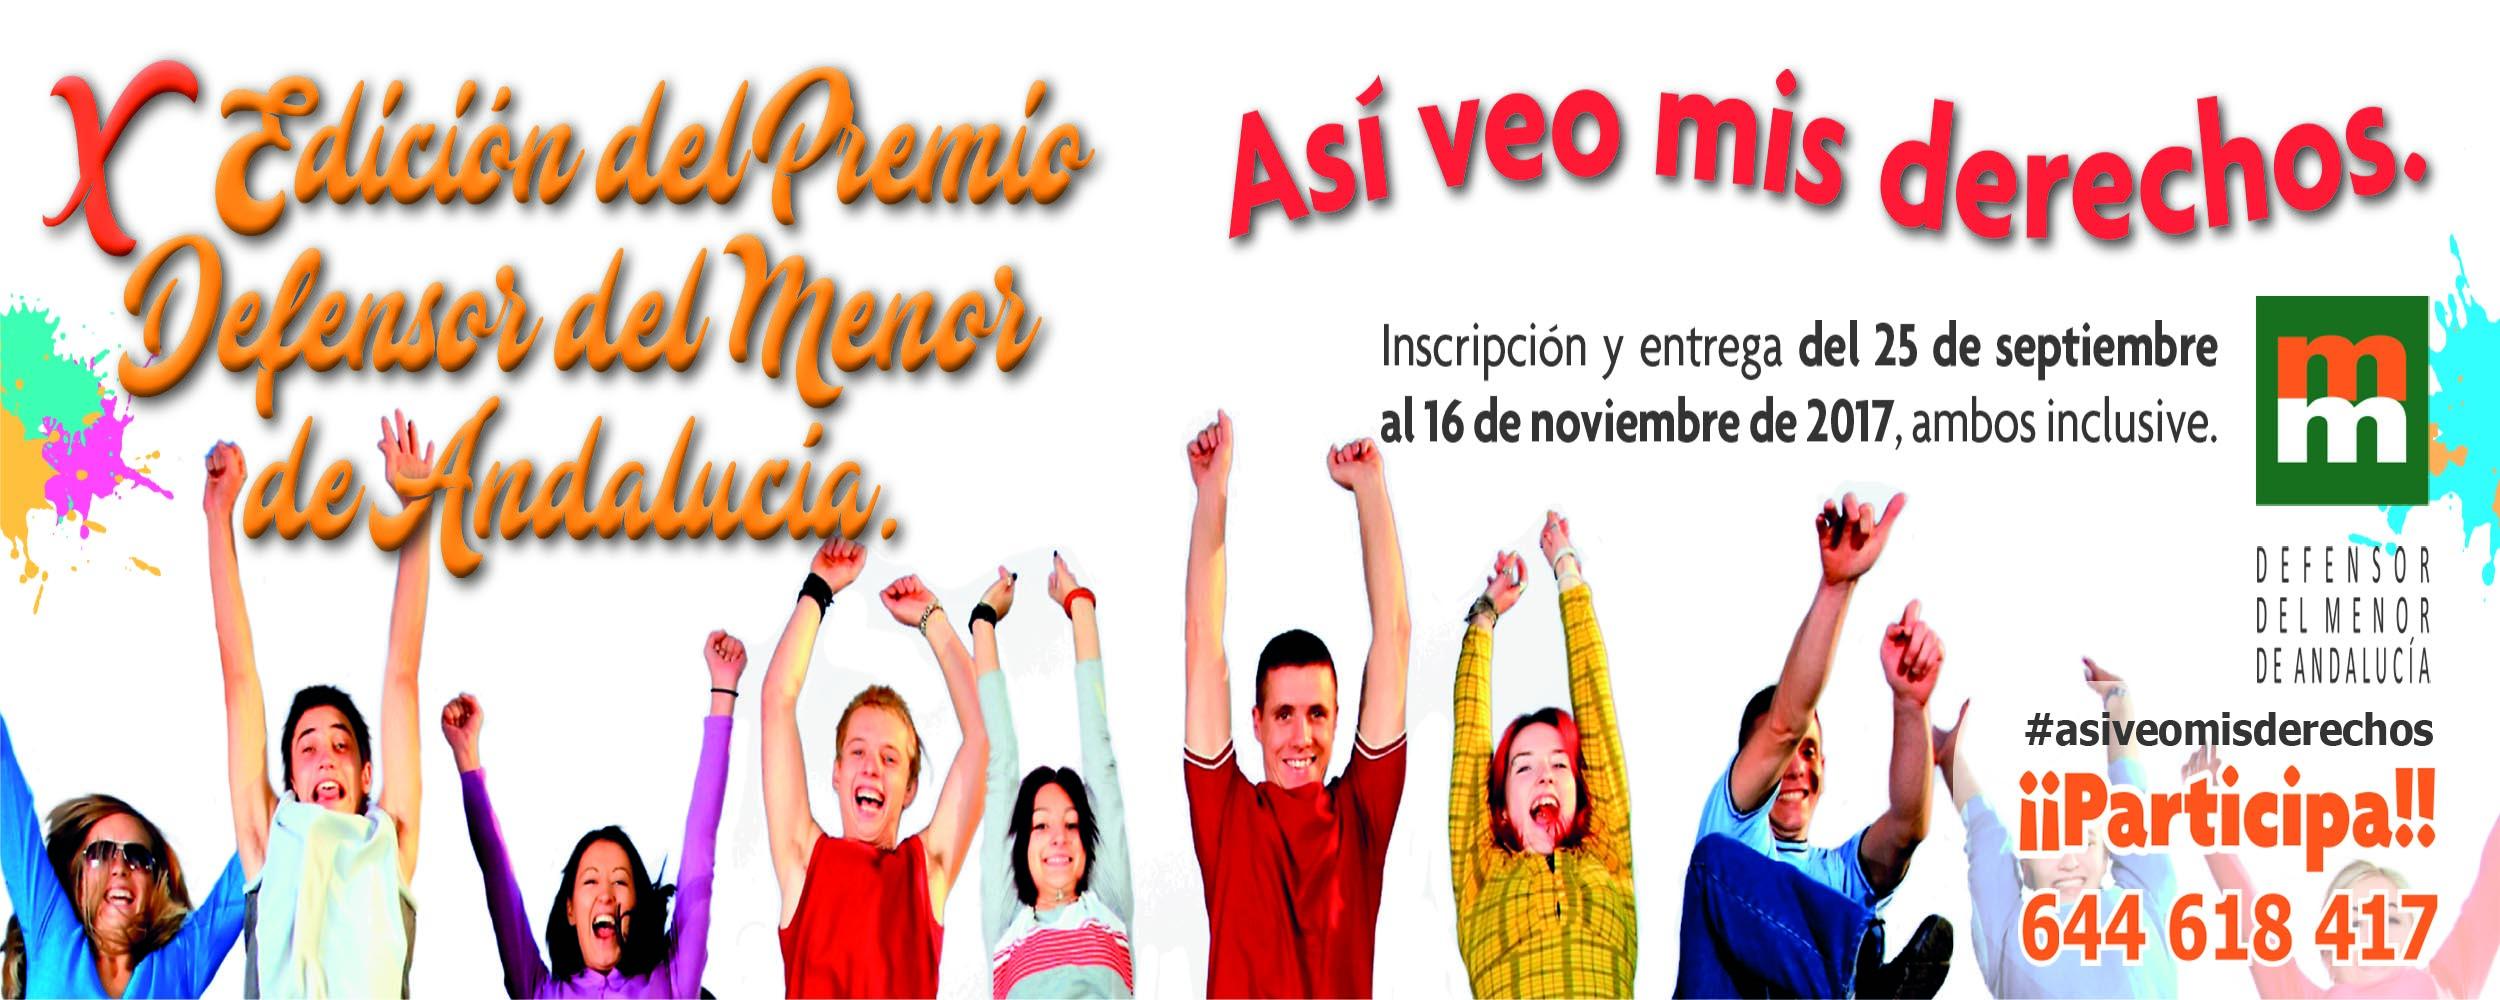 http://asiveomisderechos.publicartis.com/